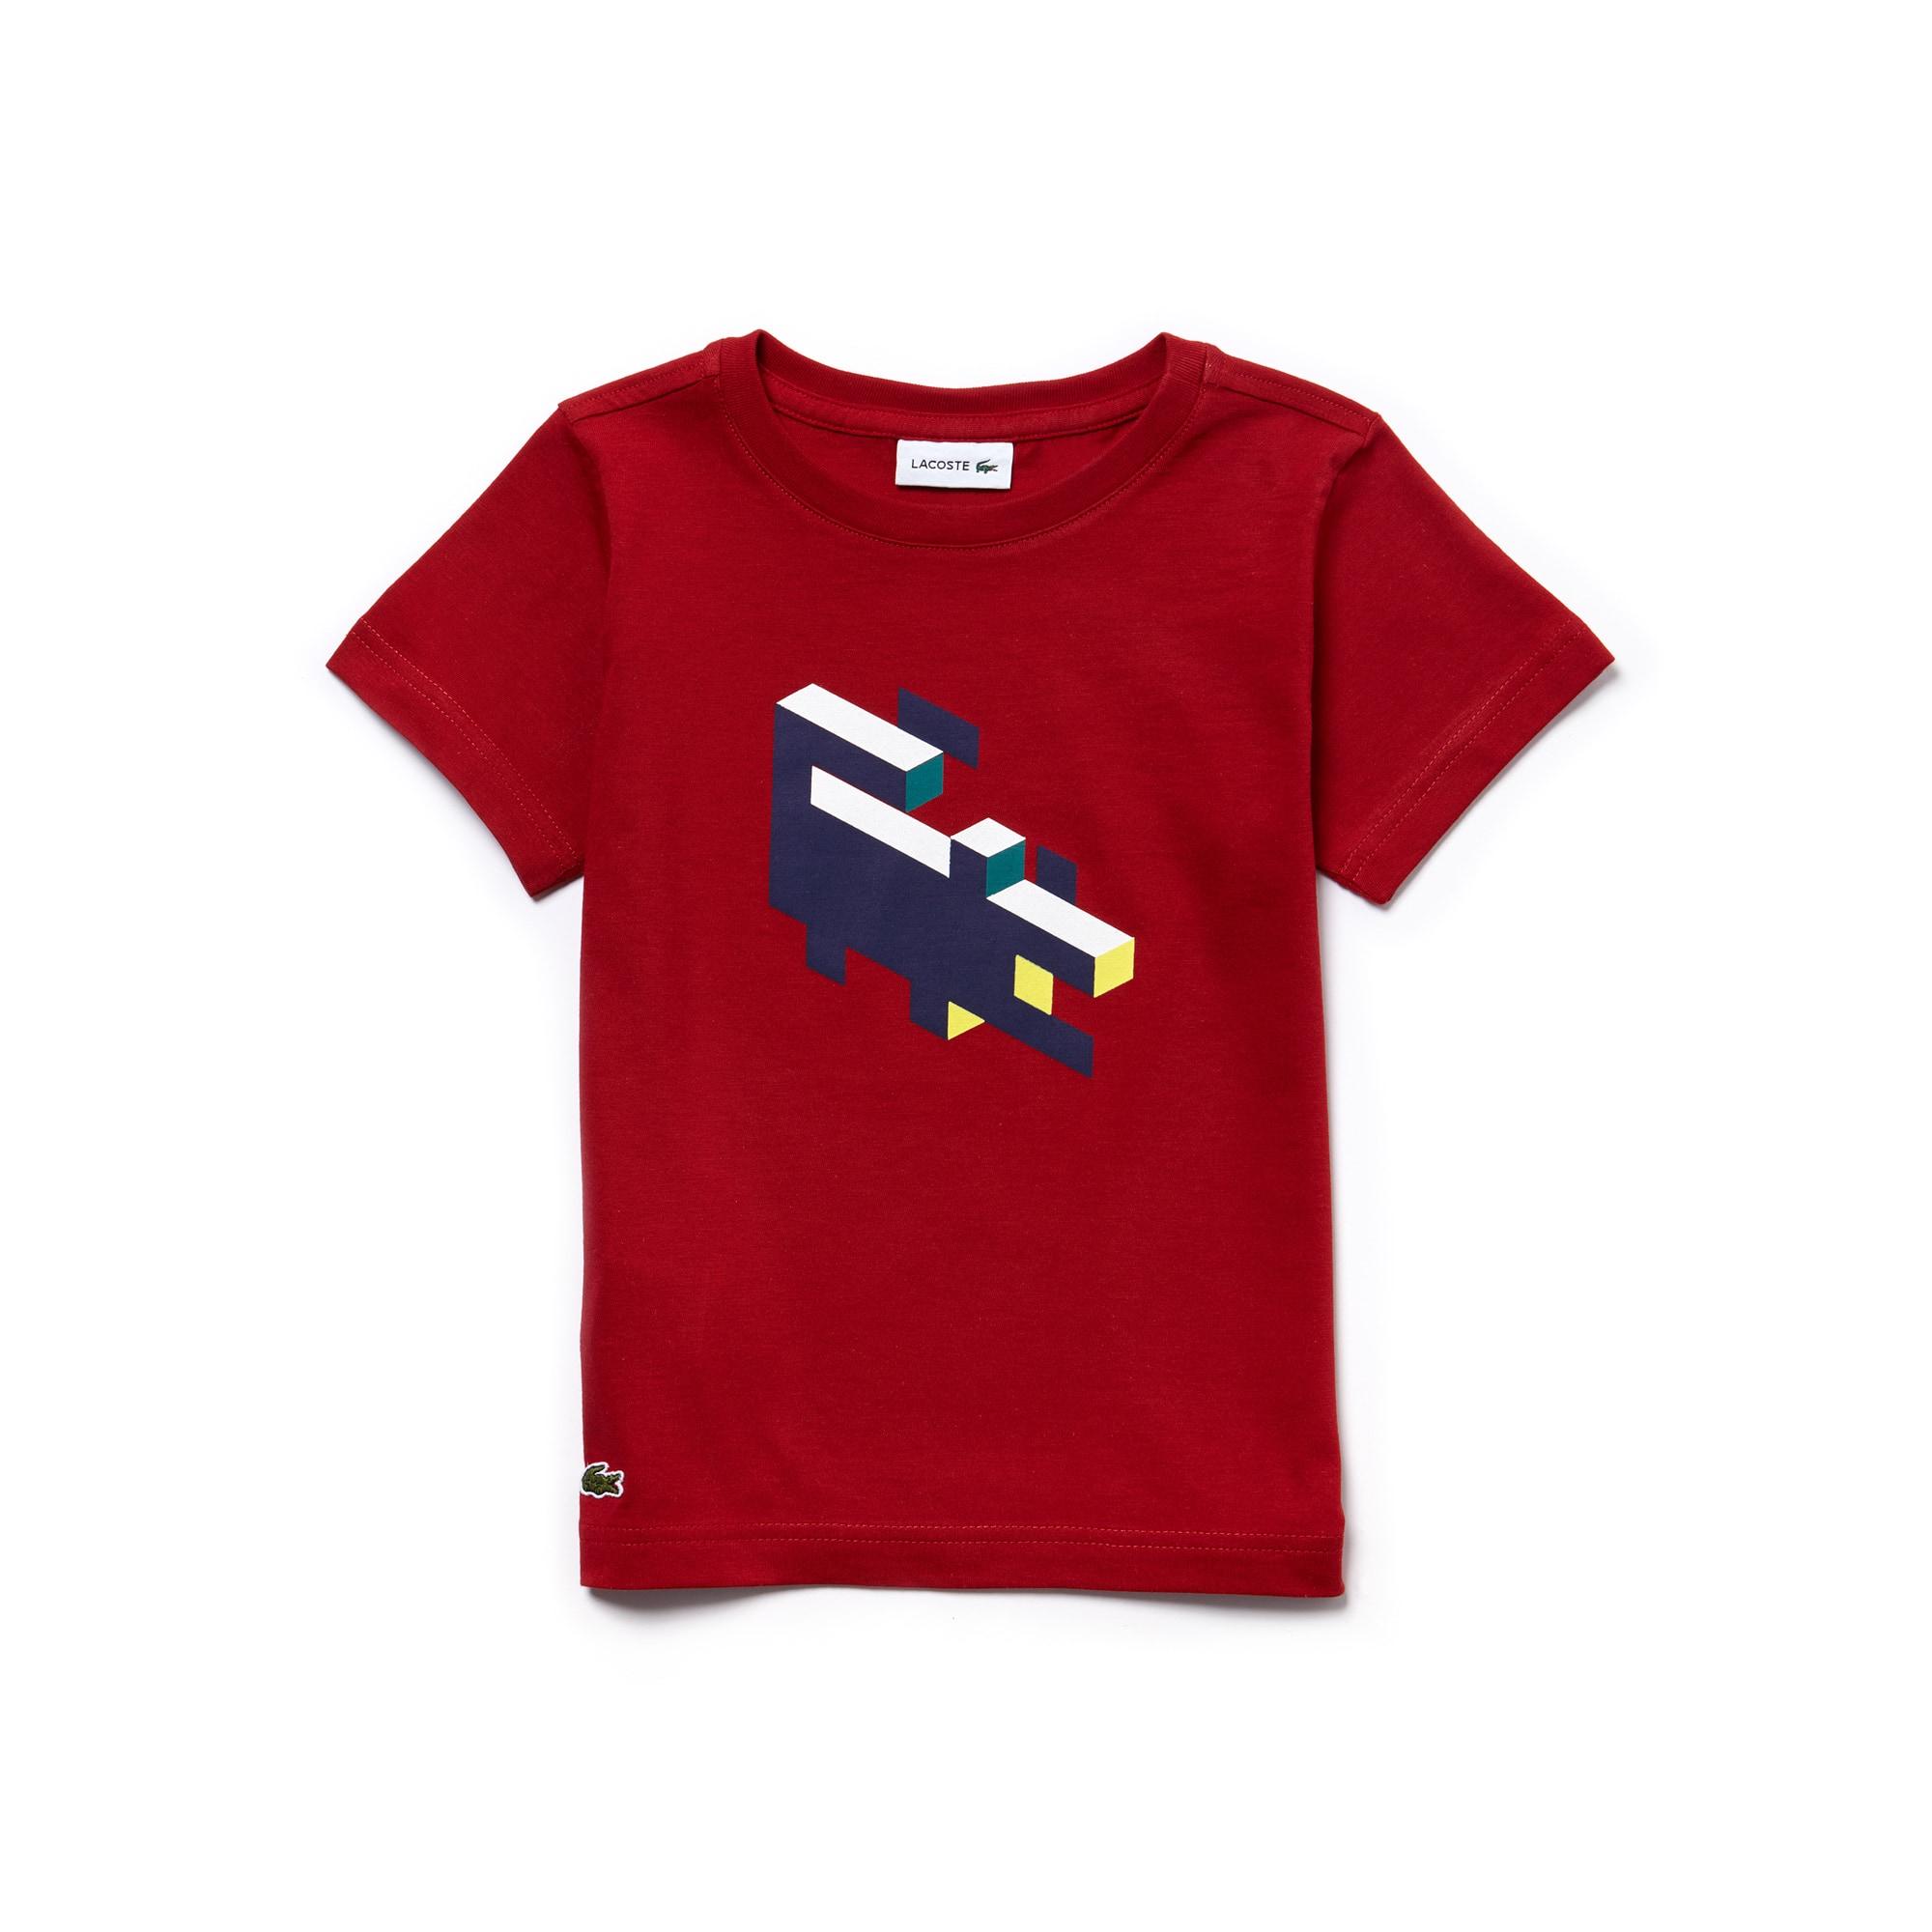 Boys' Croc Lego Jersey T-shirt